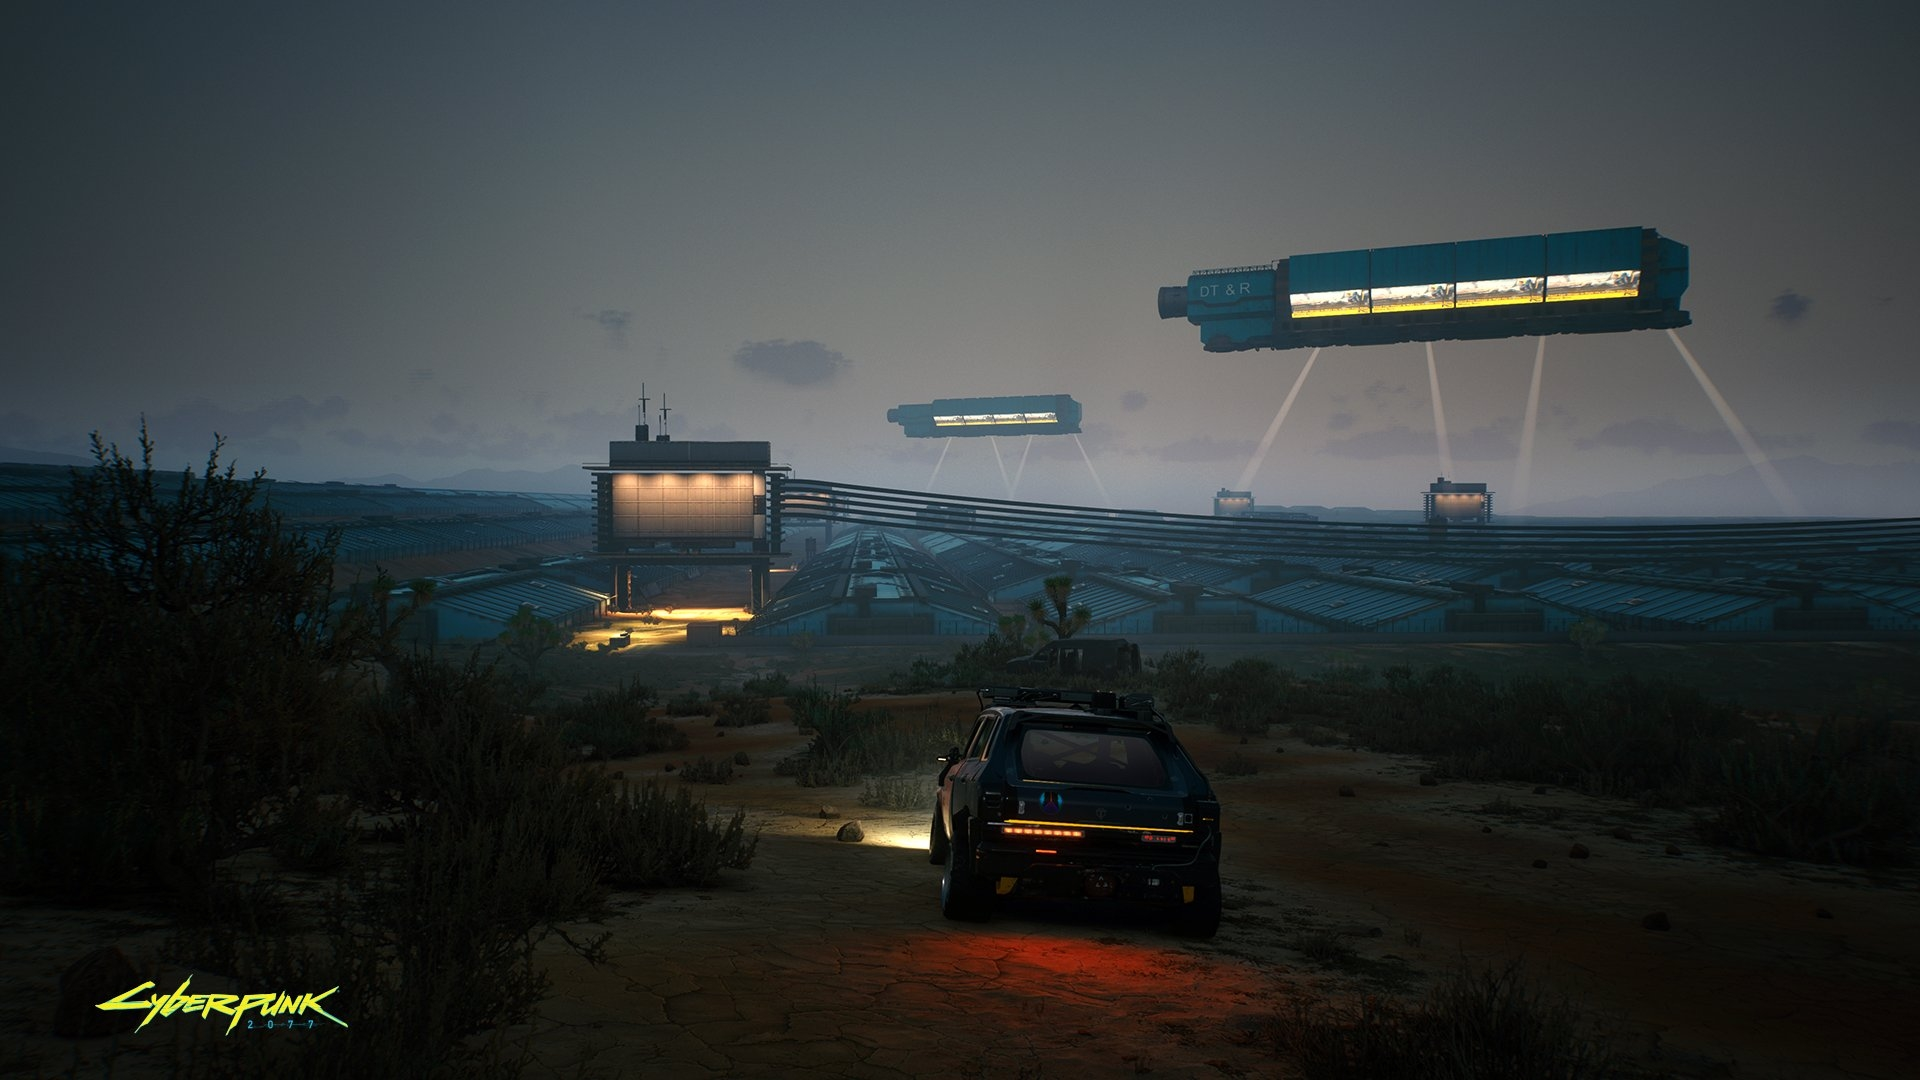 cyberpunk-2077-badlands